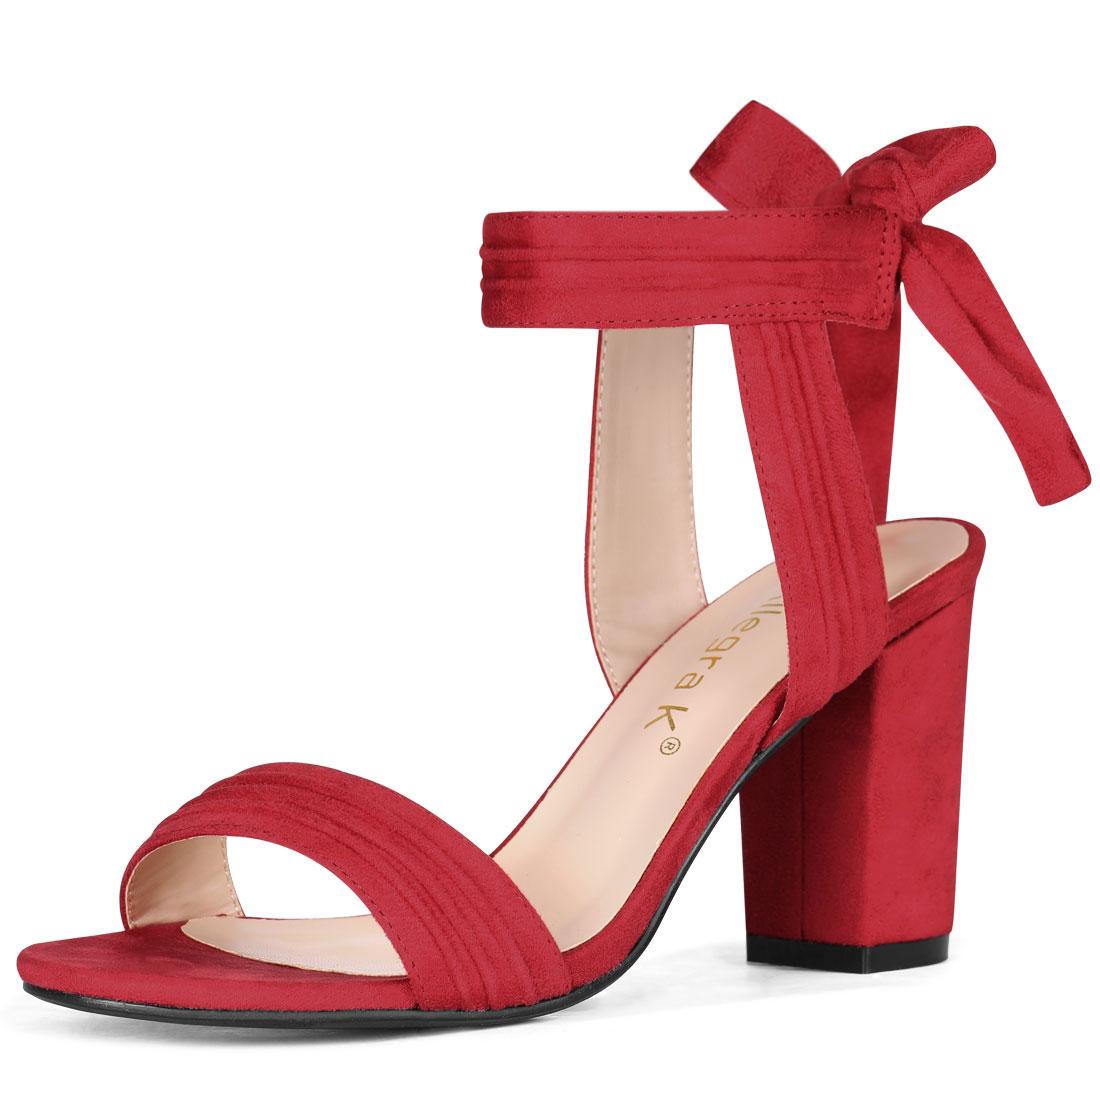 Allegra K Women's Open Toe Ankle Tie Back Chunky Heel Sandals Red US 9